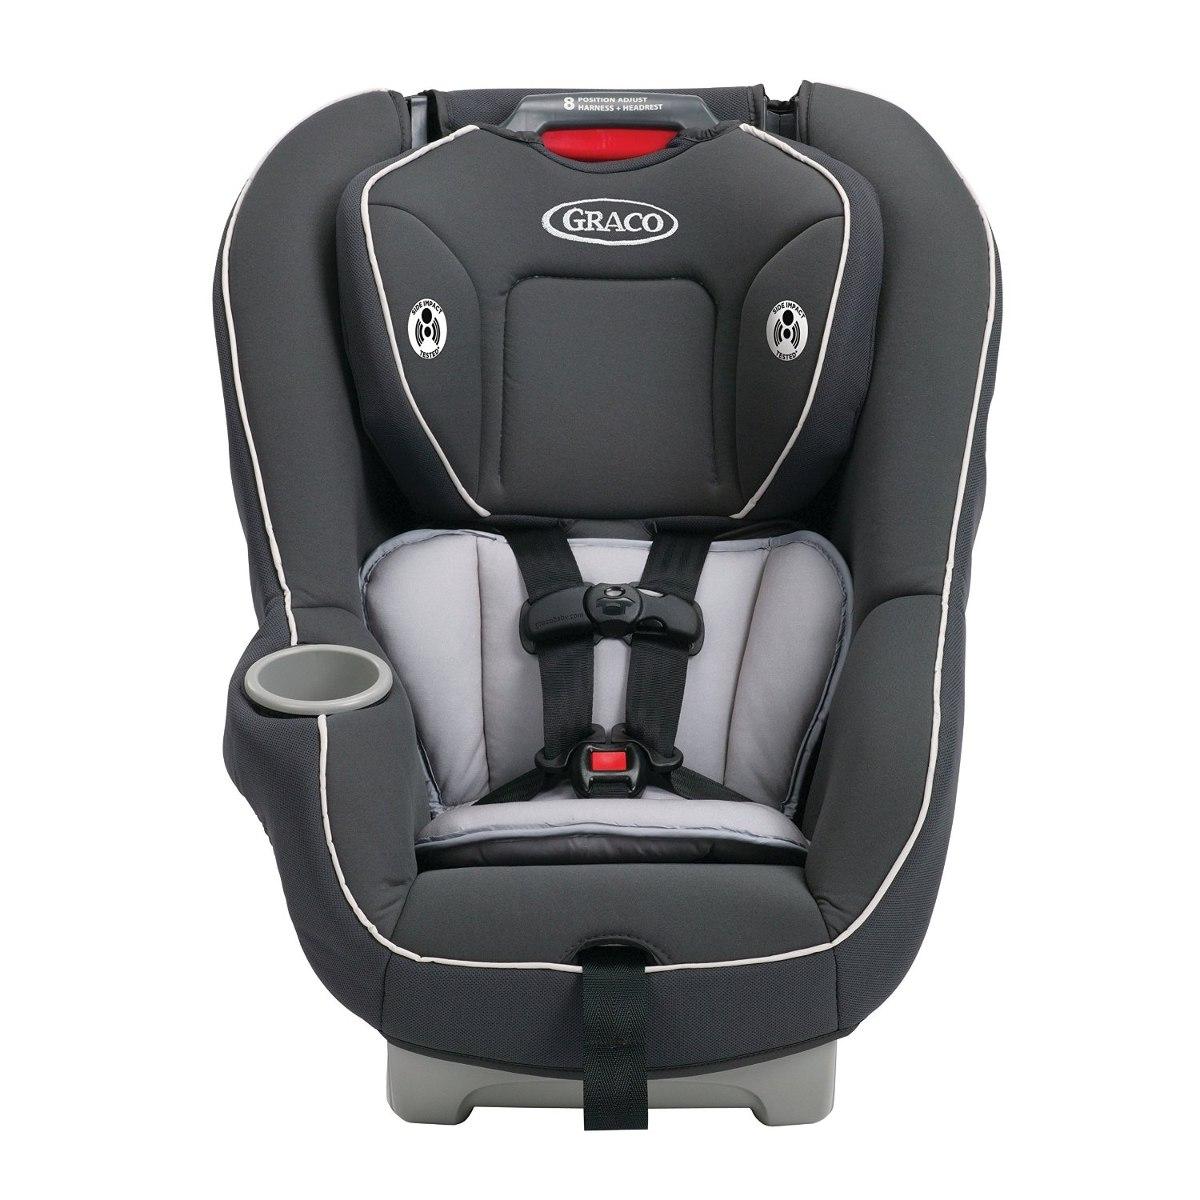 Silla De Beb Para Carro Graco Contender Asiento 65 Coche